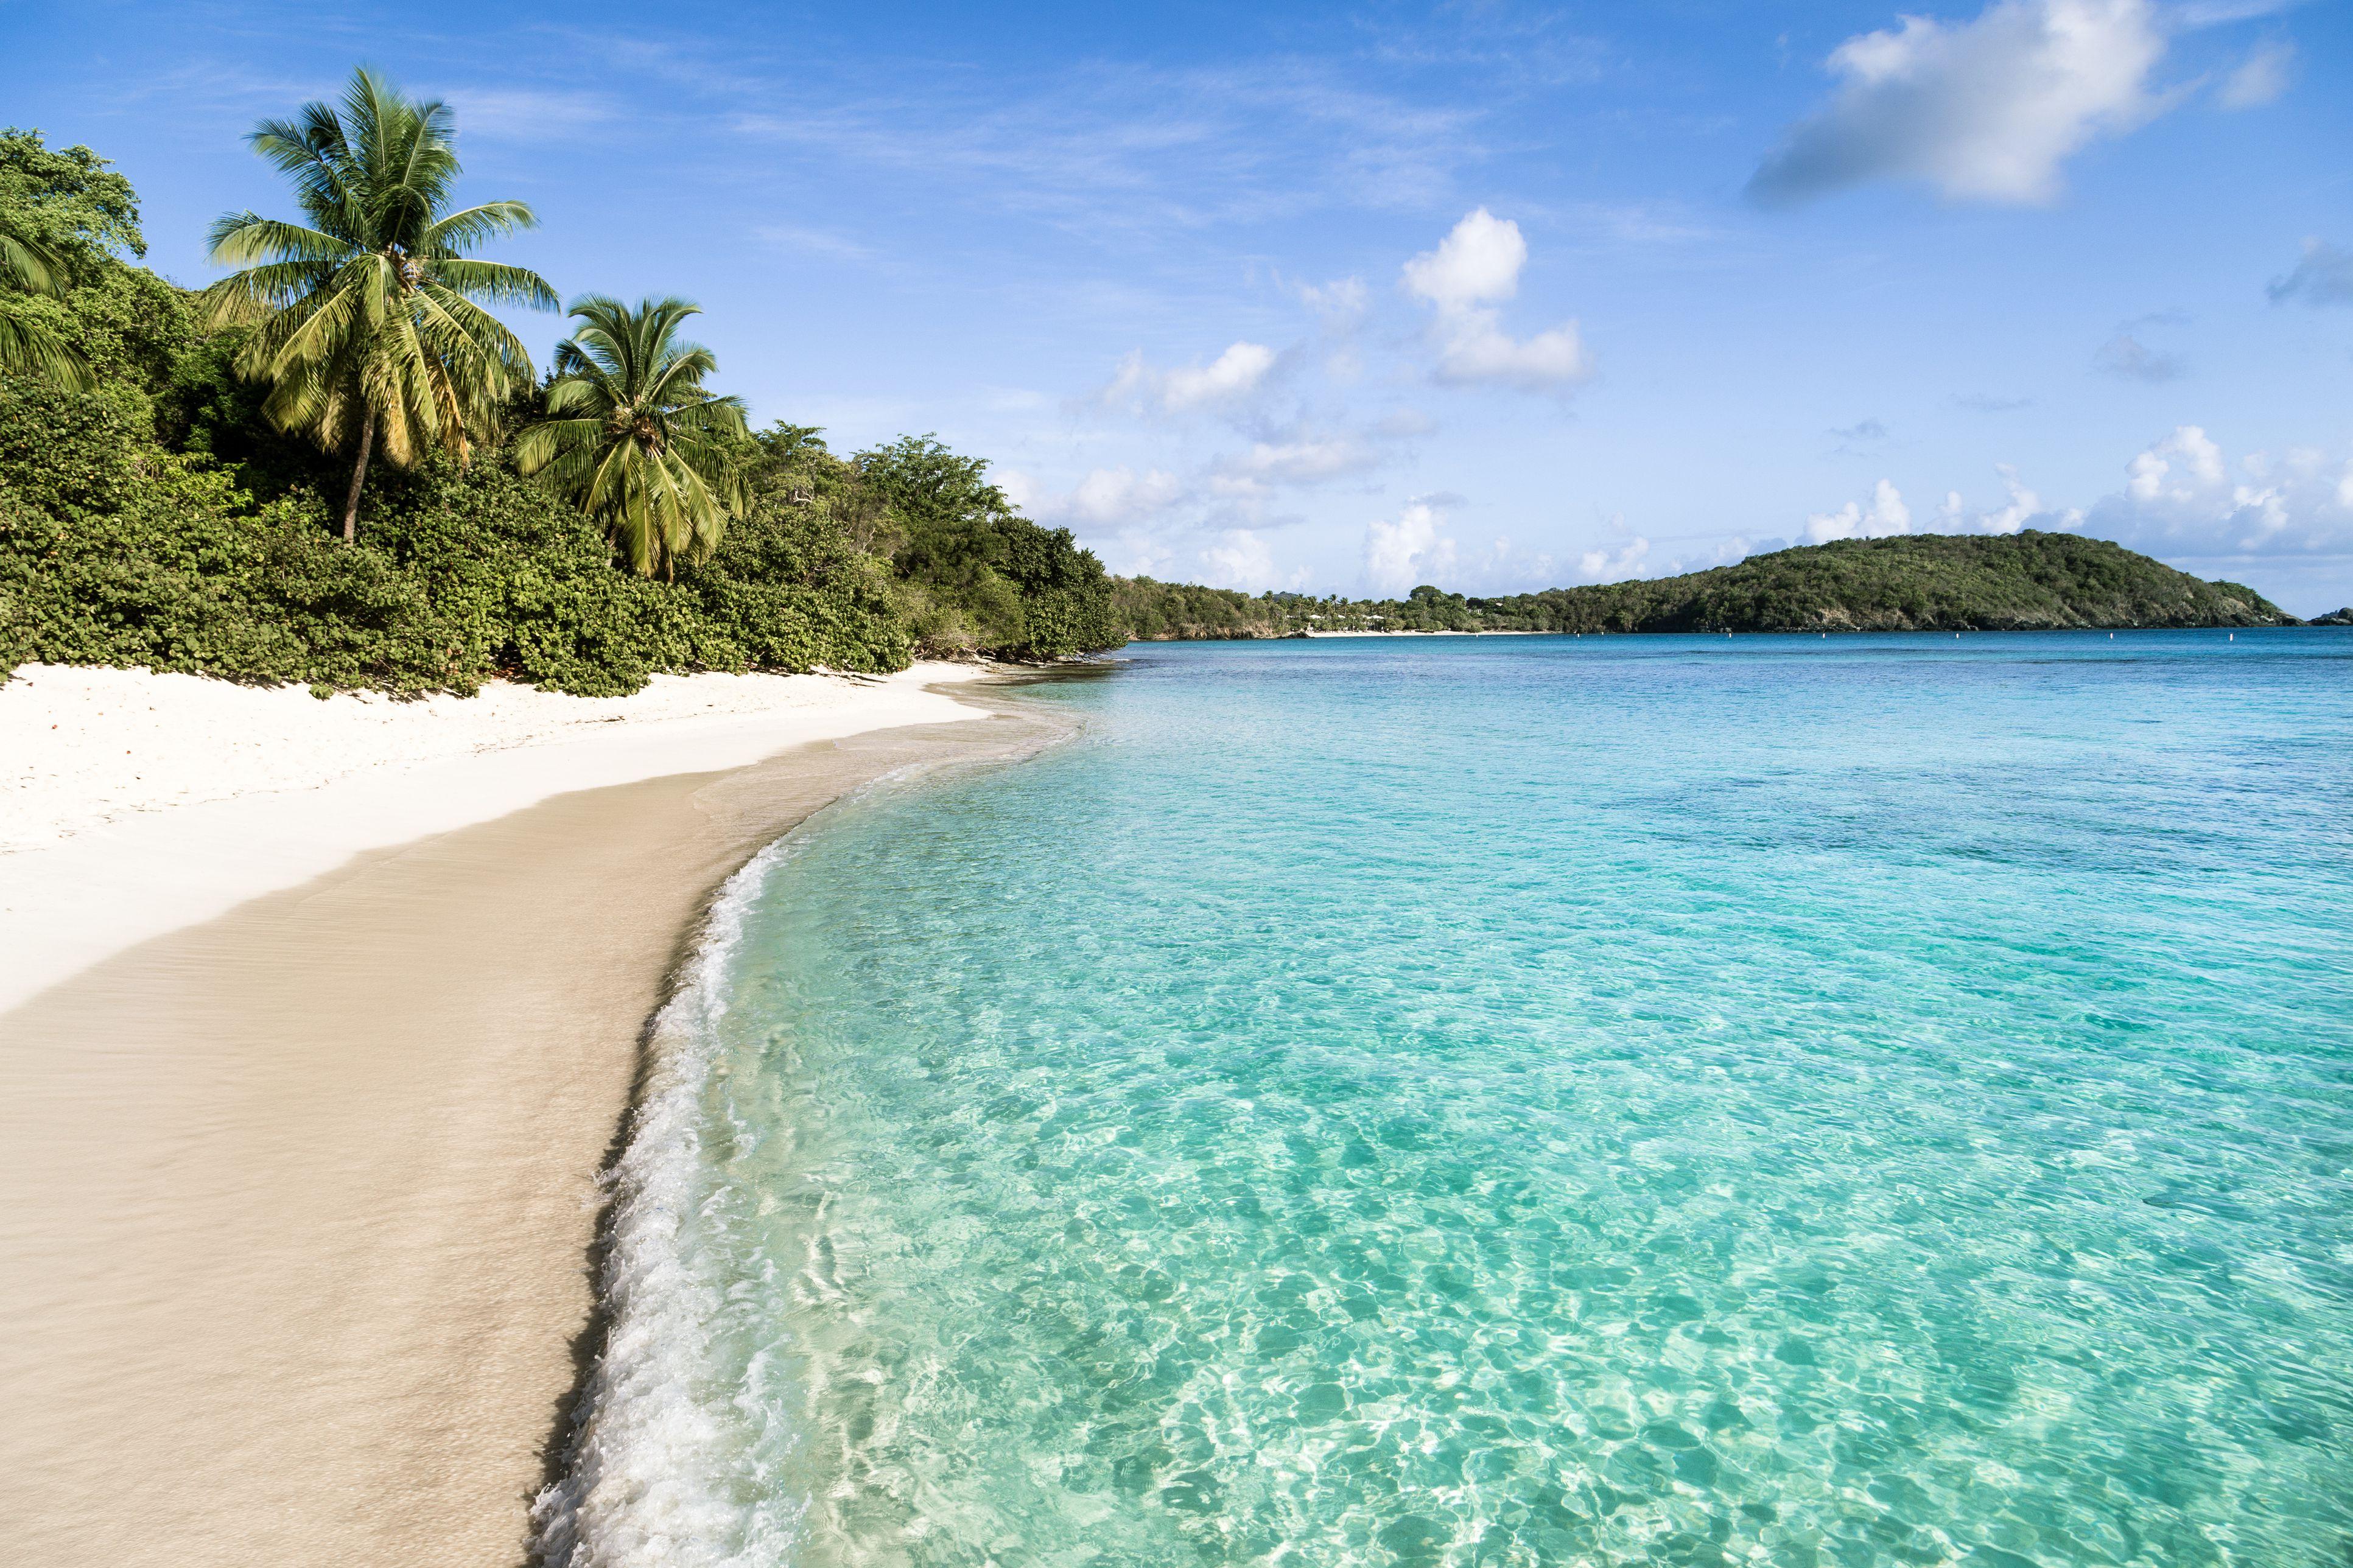 Top Six Beaches on St. John, U.S. Virgin Islands